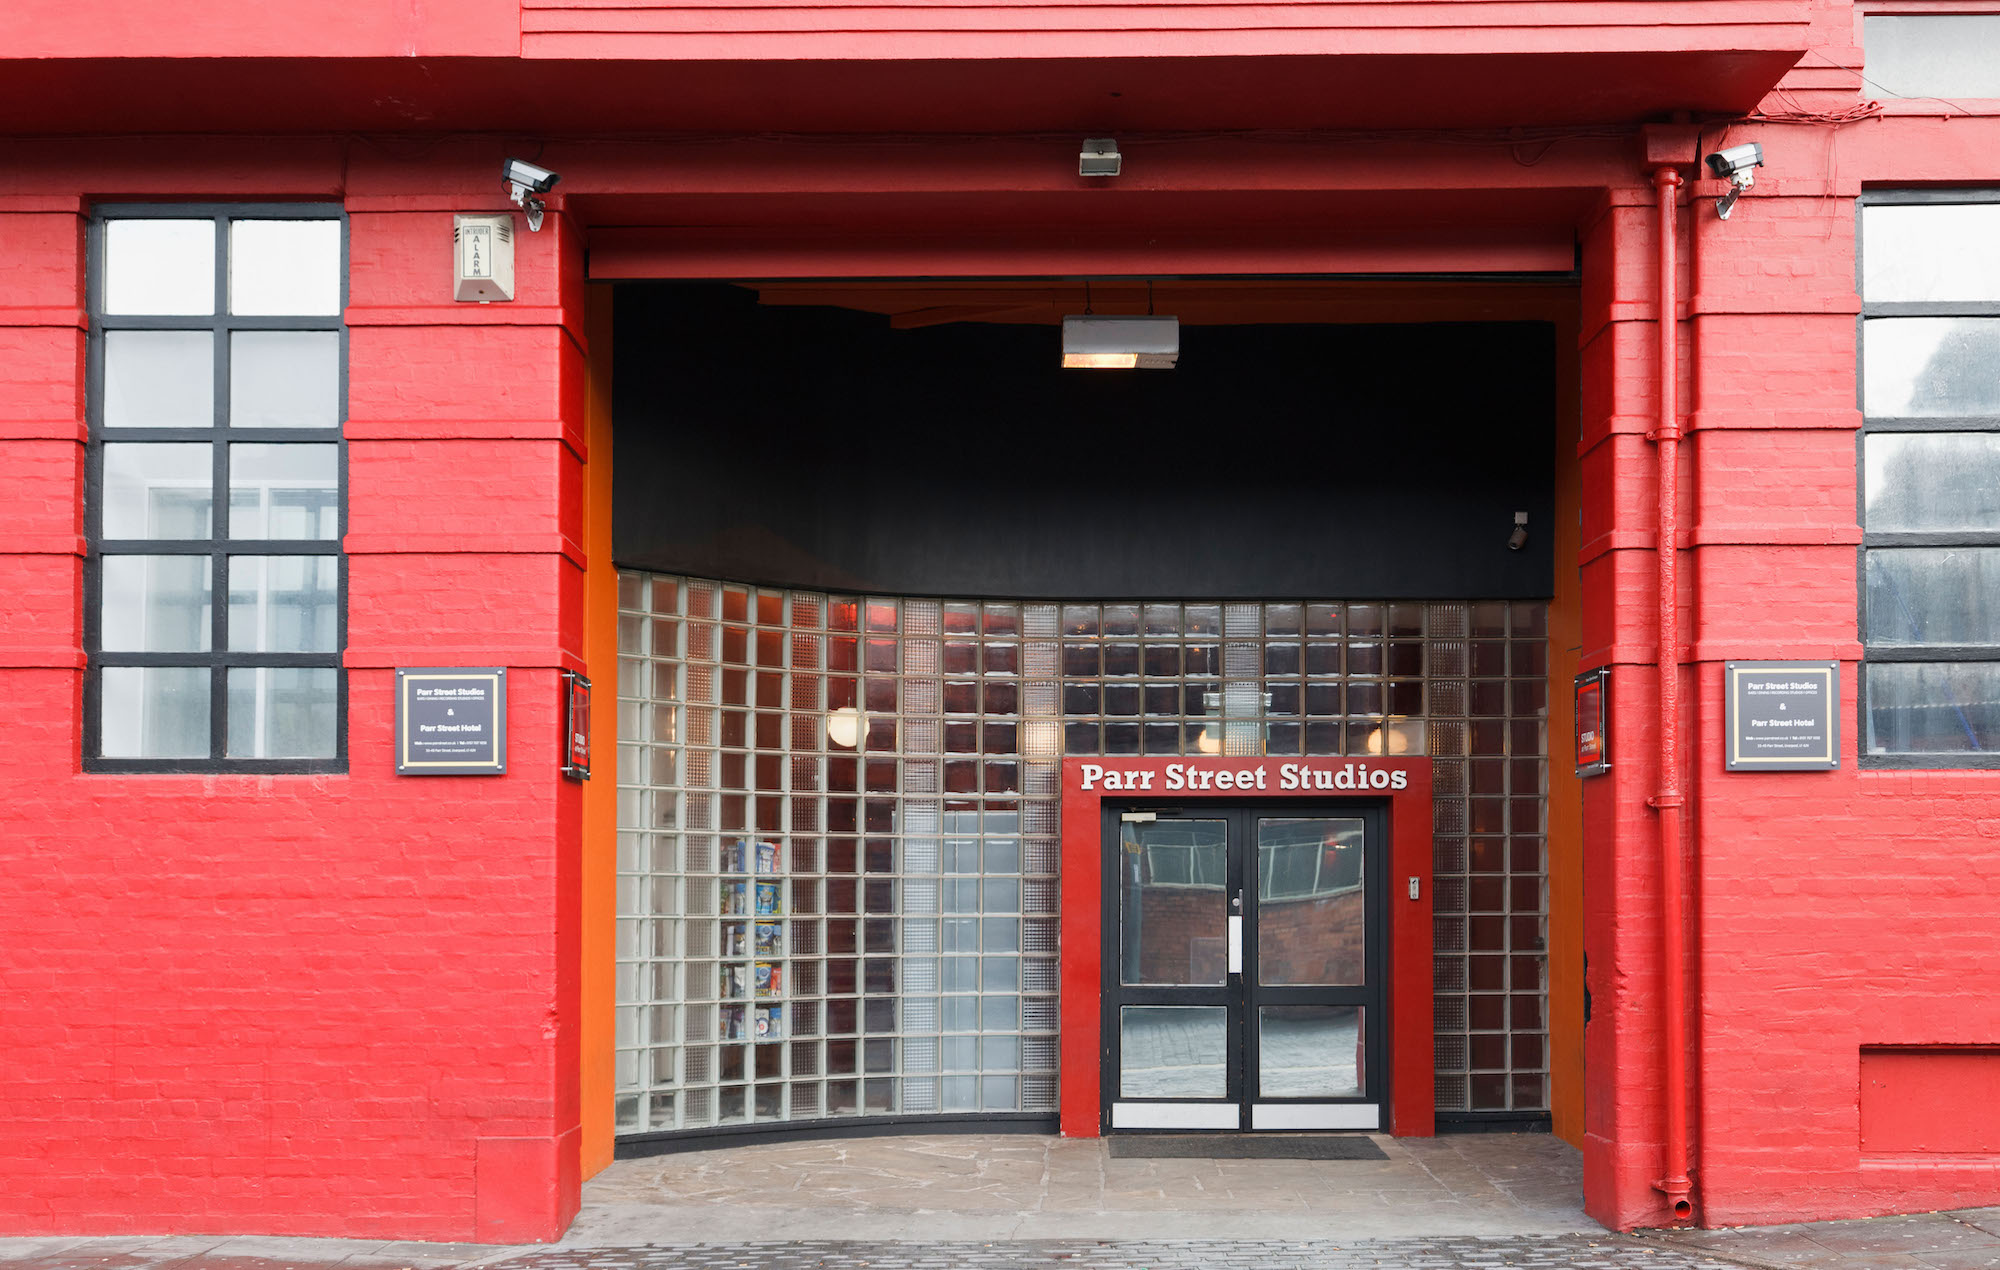 Parr Street Studios